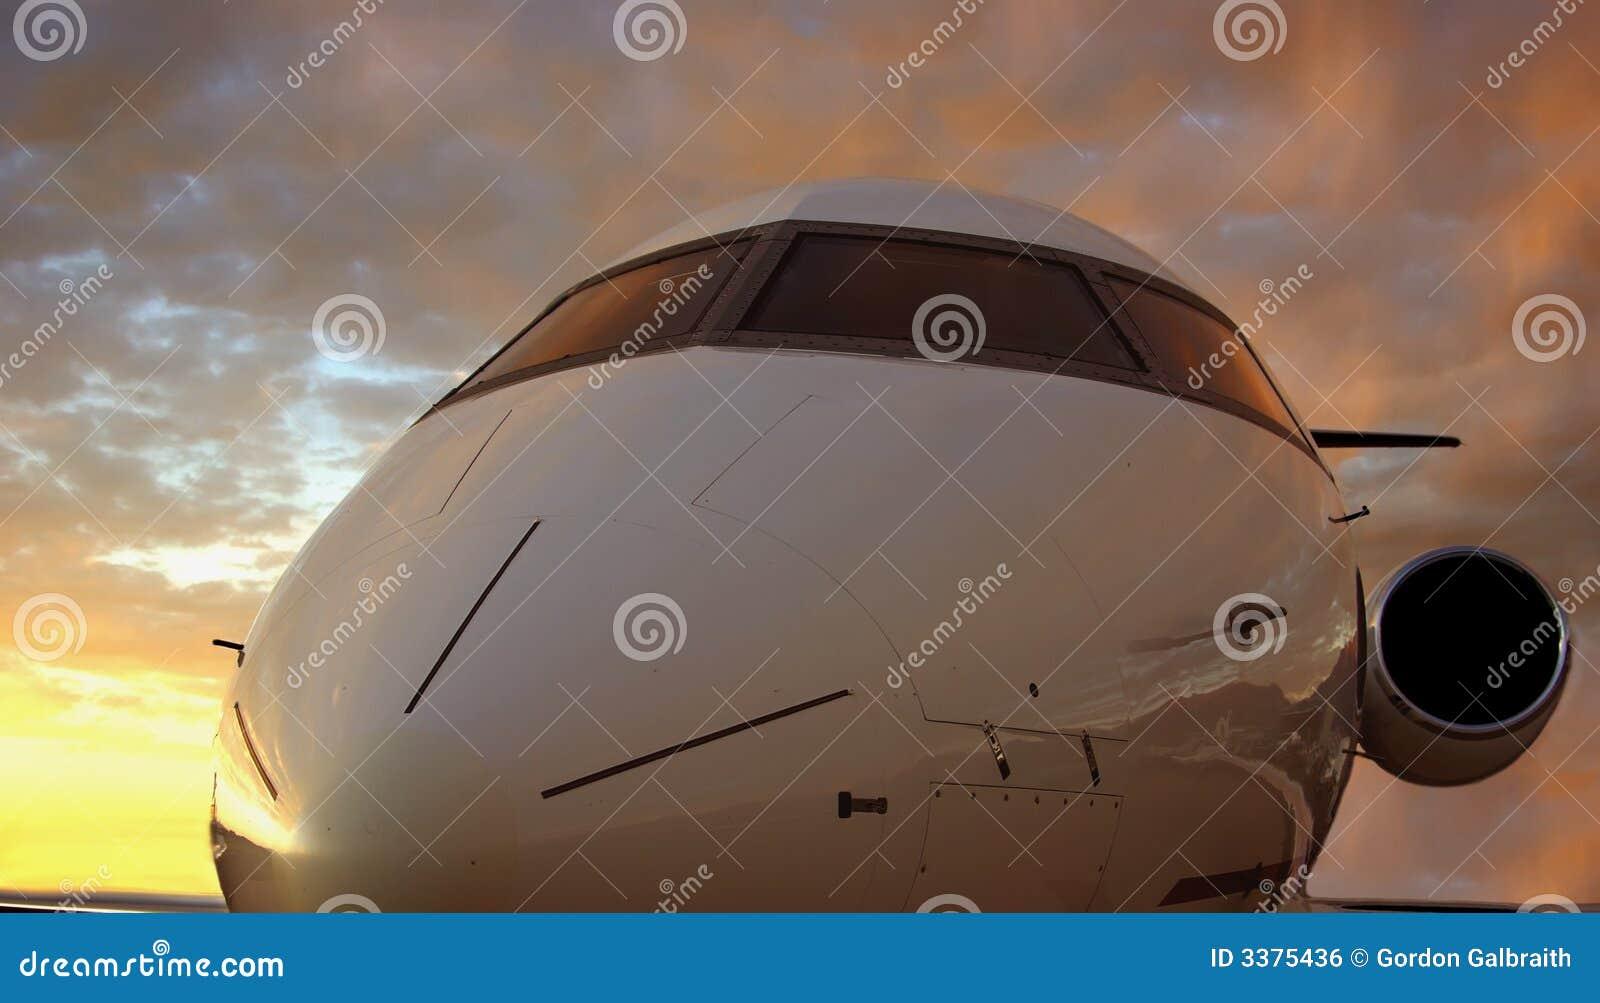 Vol de soirée